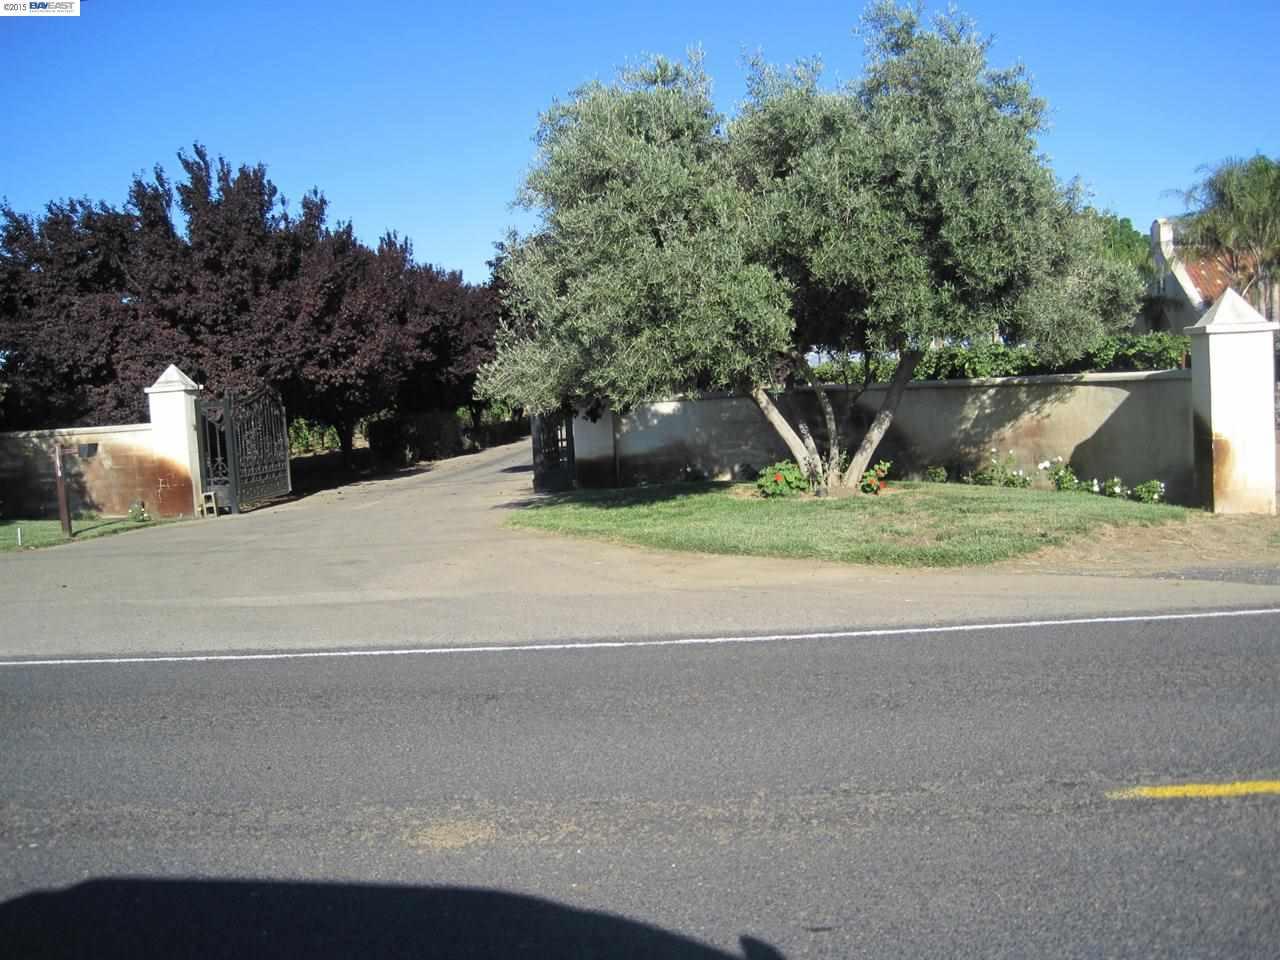 11680 Byron Highway, Brentwood, CA 94513